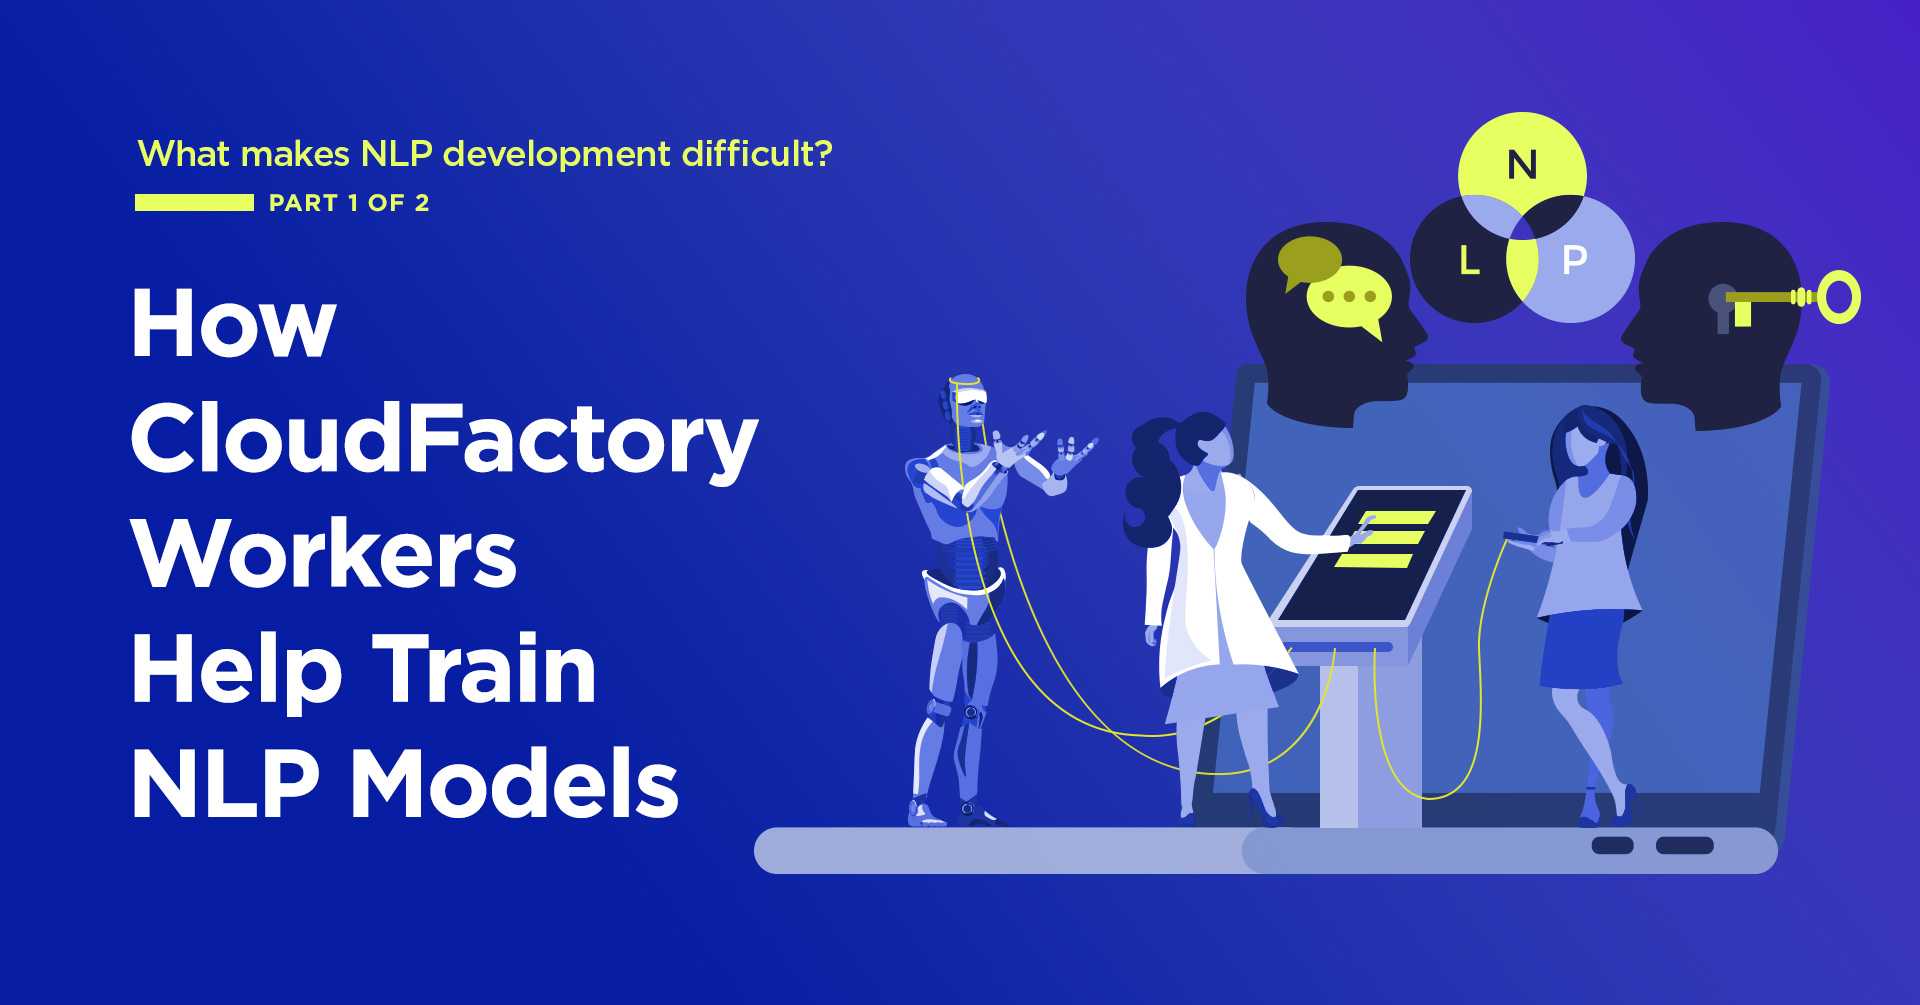 How CloudFactory Workers Help Train NLP Models How CloudFactory Workers Help Train NLP Models